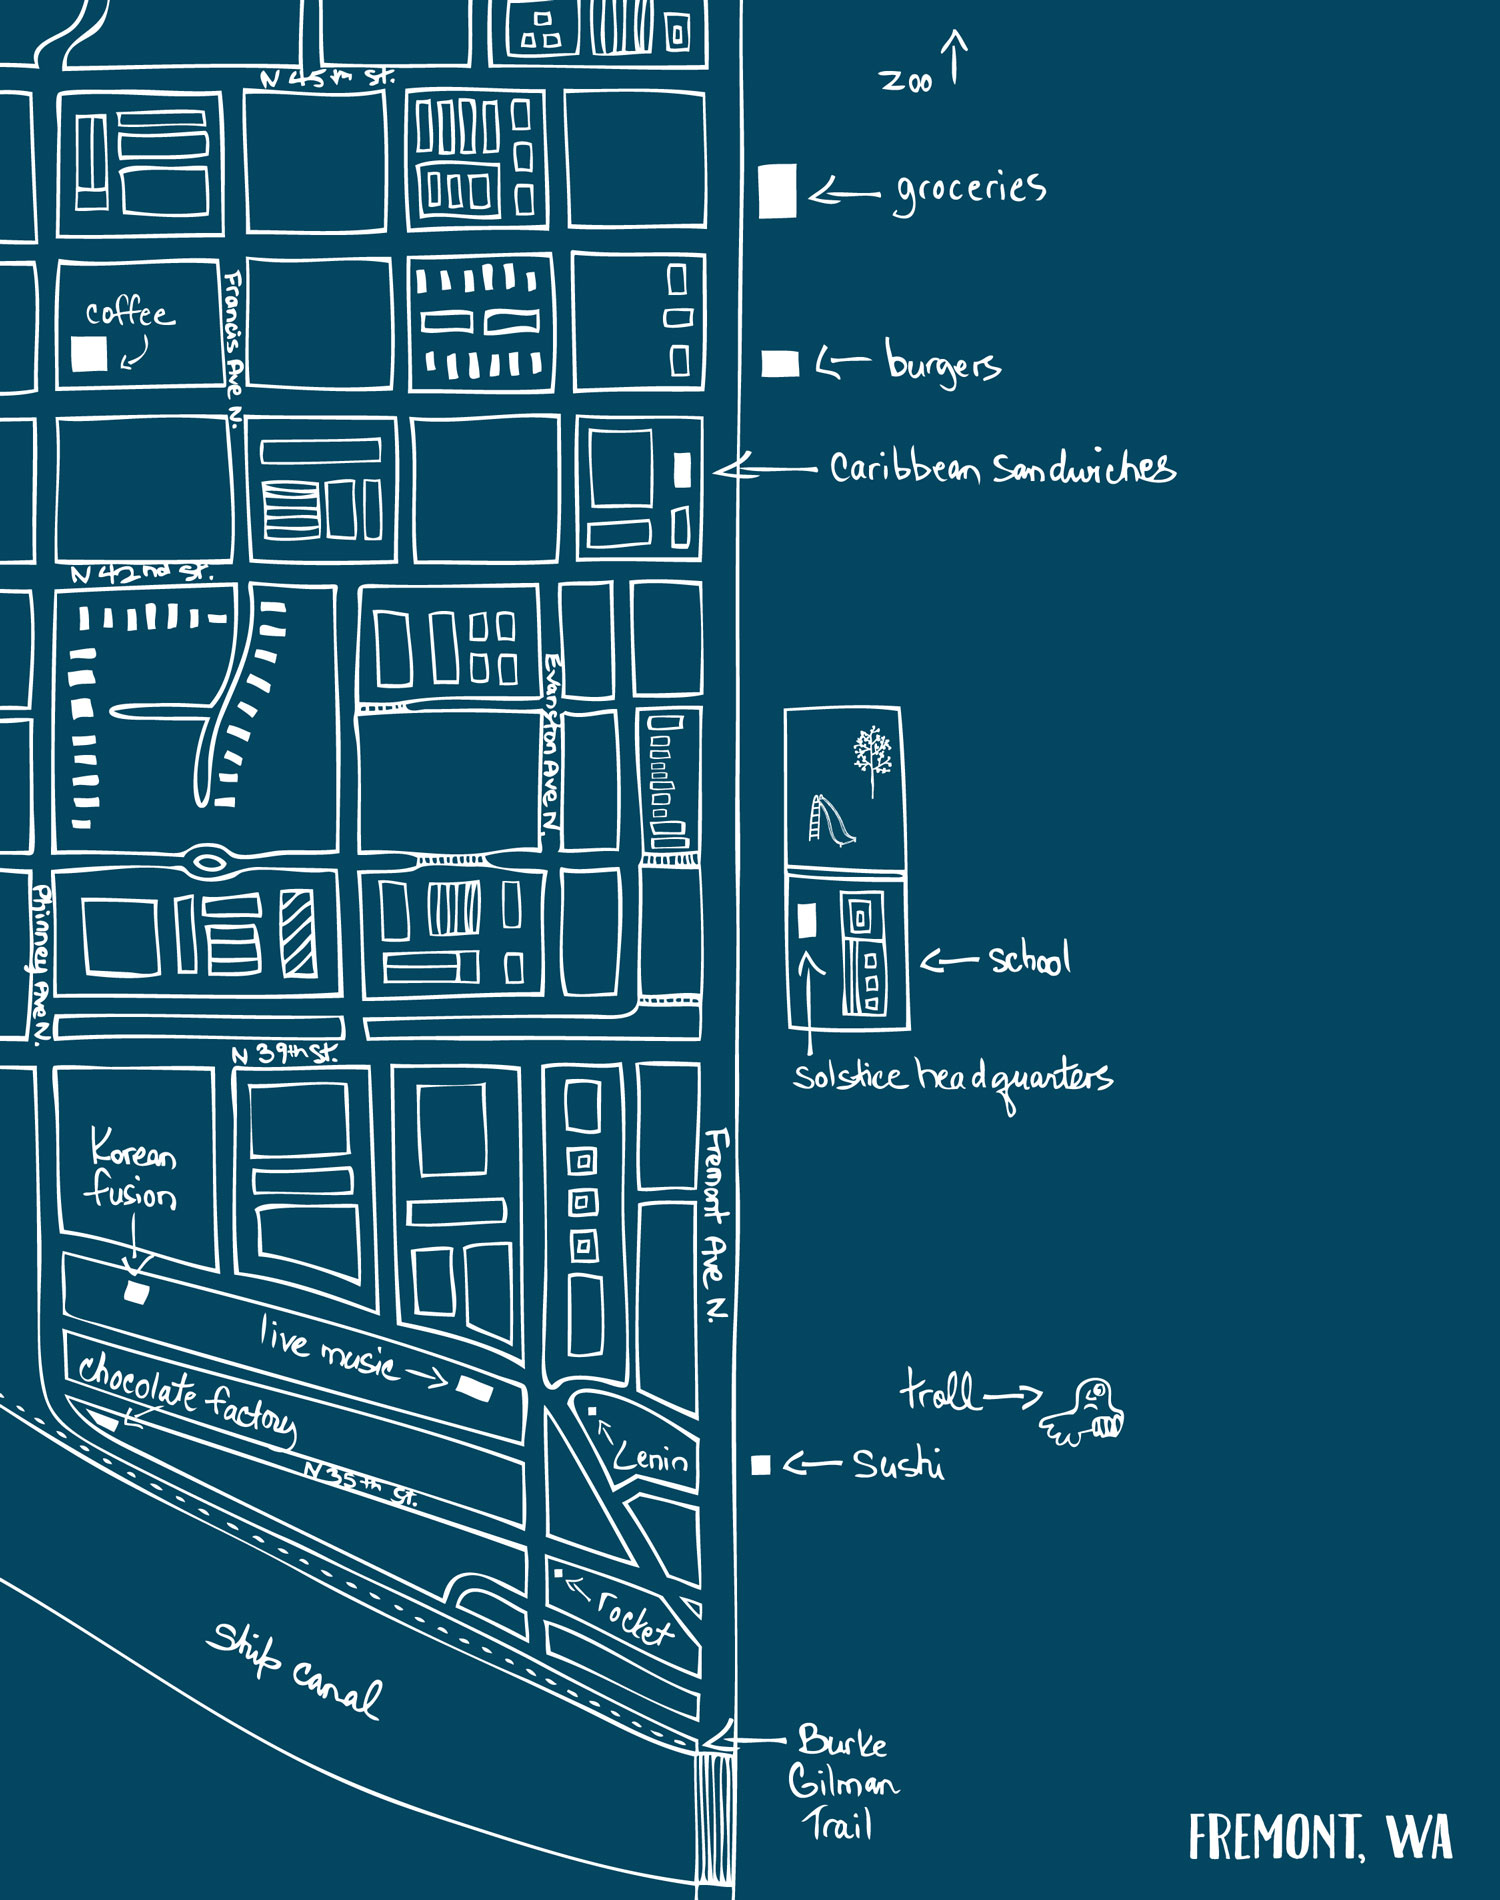 Map of Fremont neighborhood in Seattle by Laurie Baars